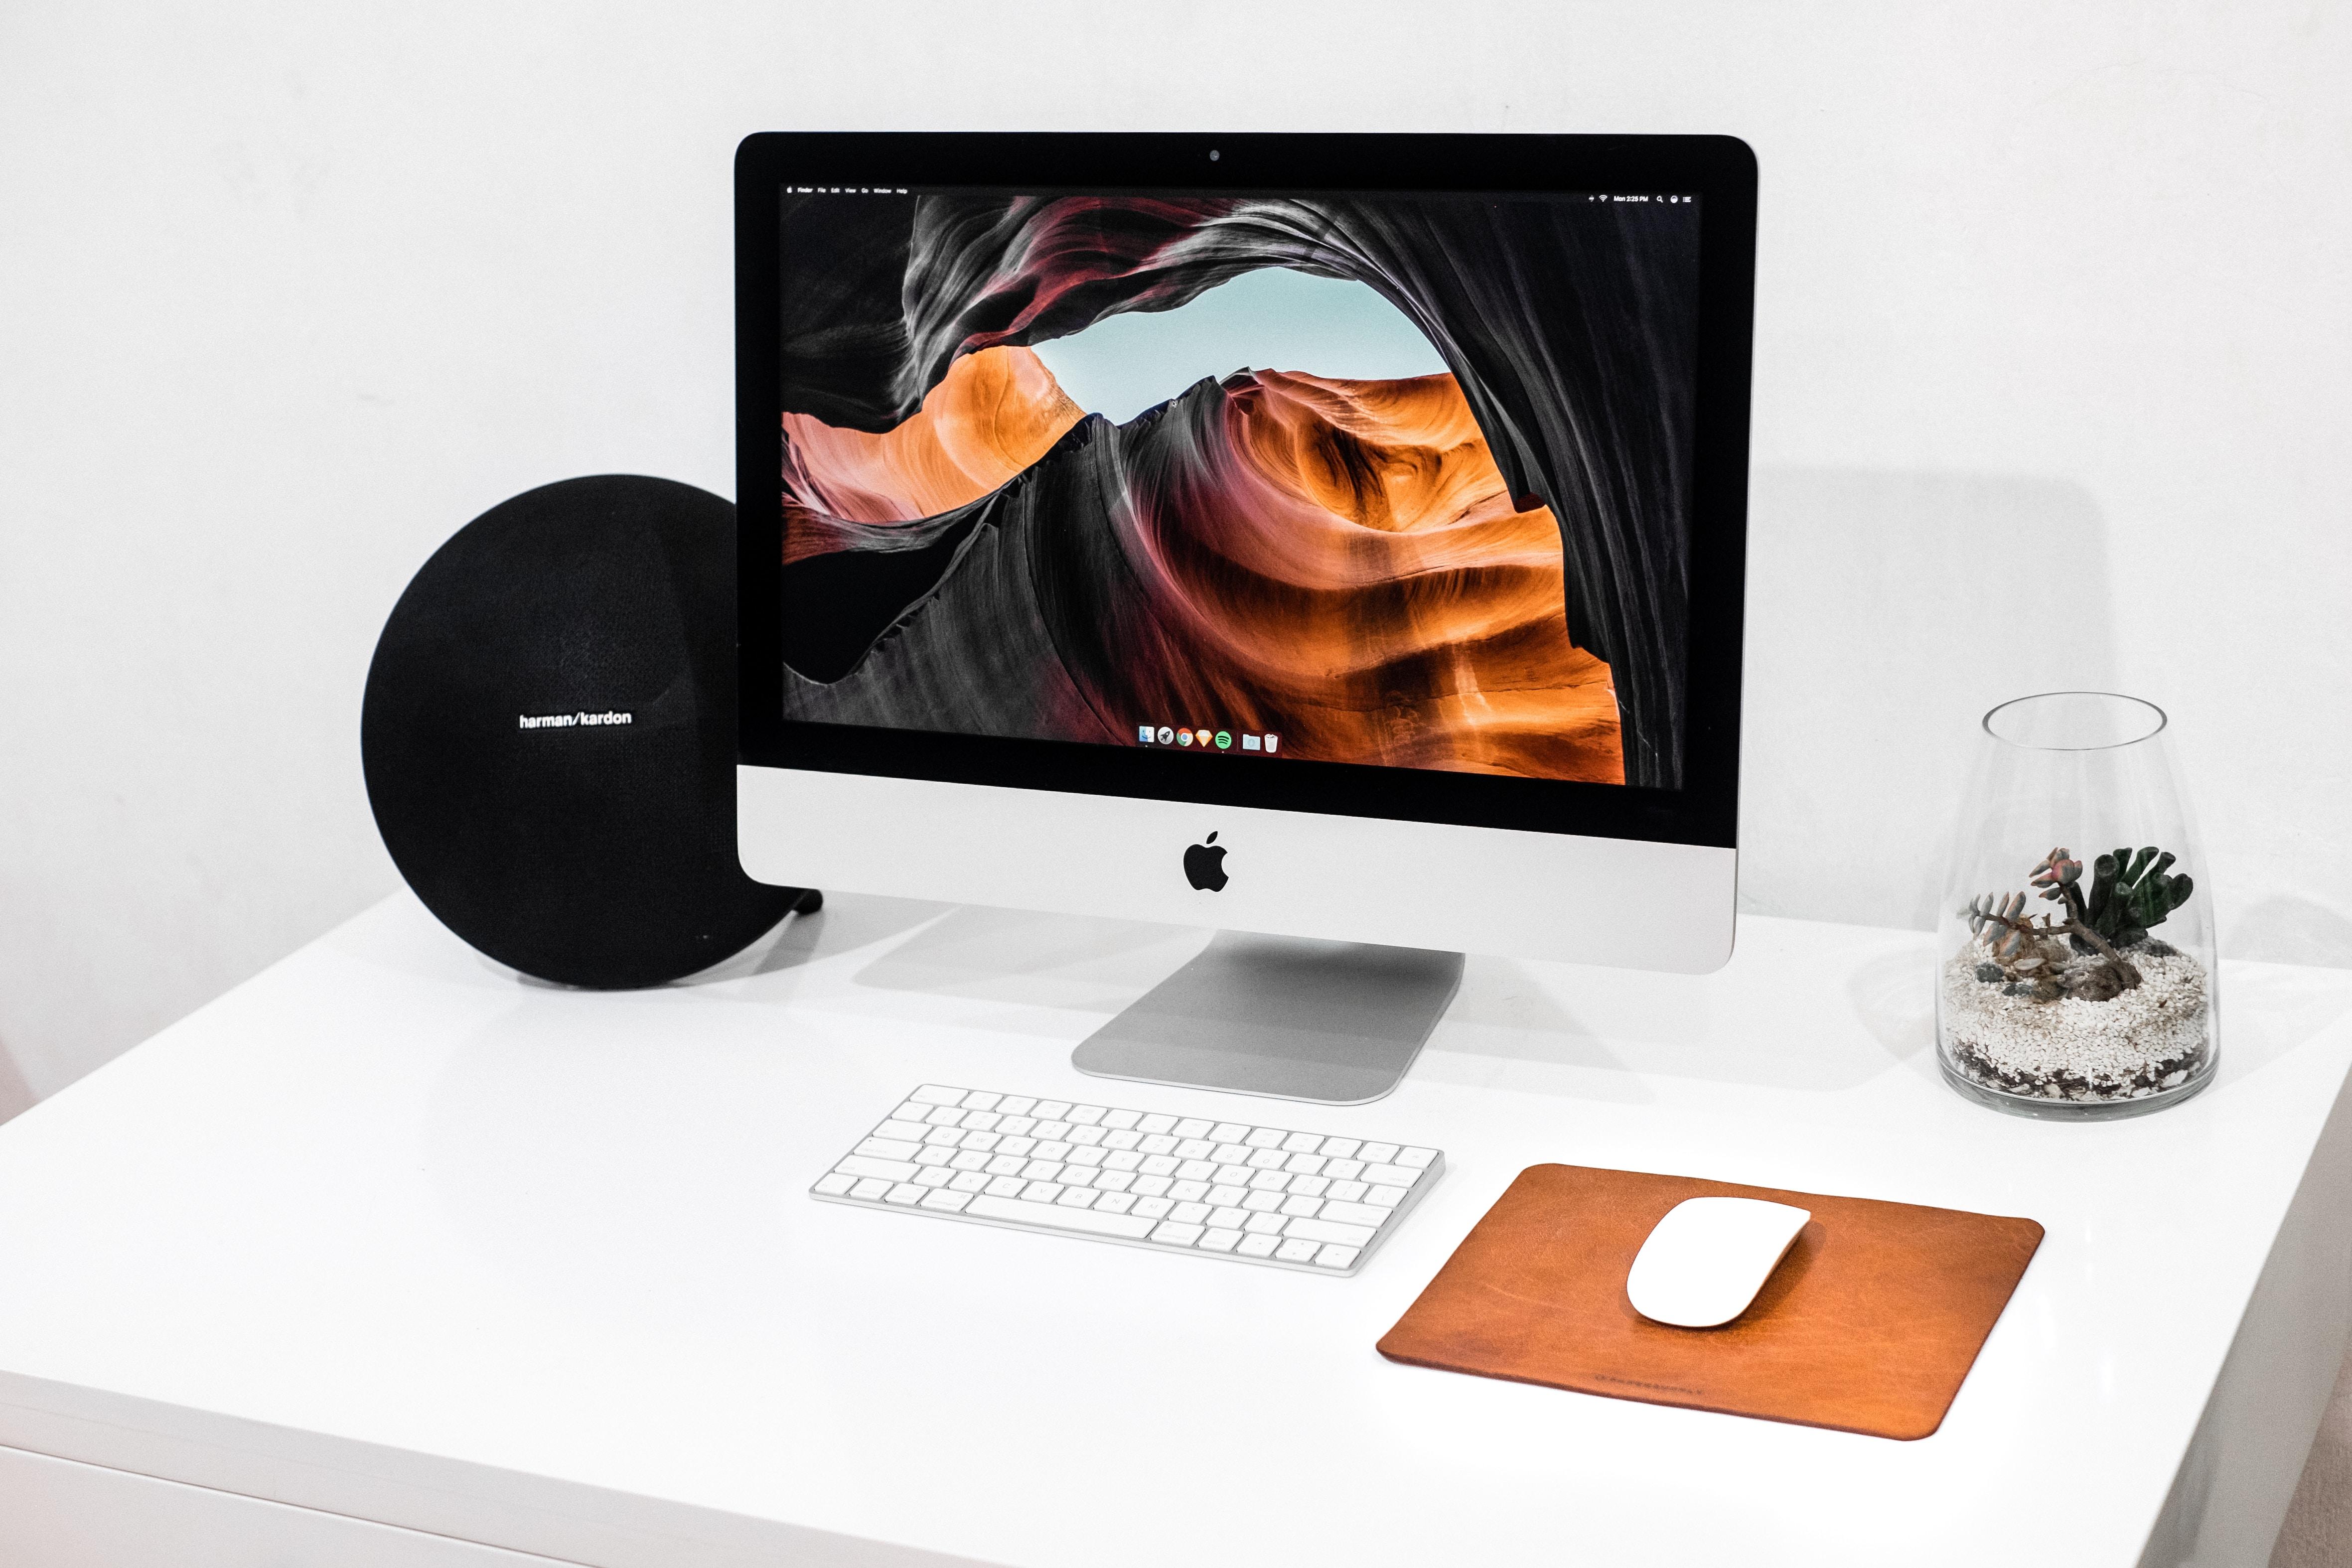 Apple Aficionados hand-picked from Unsplash